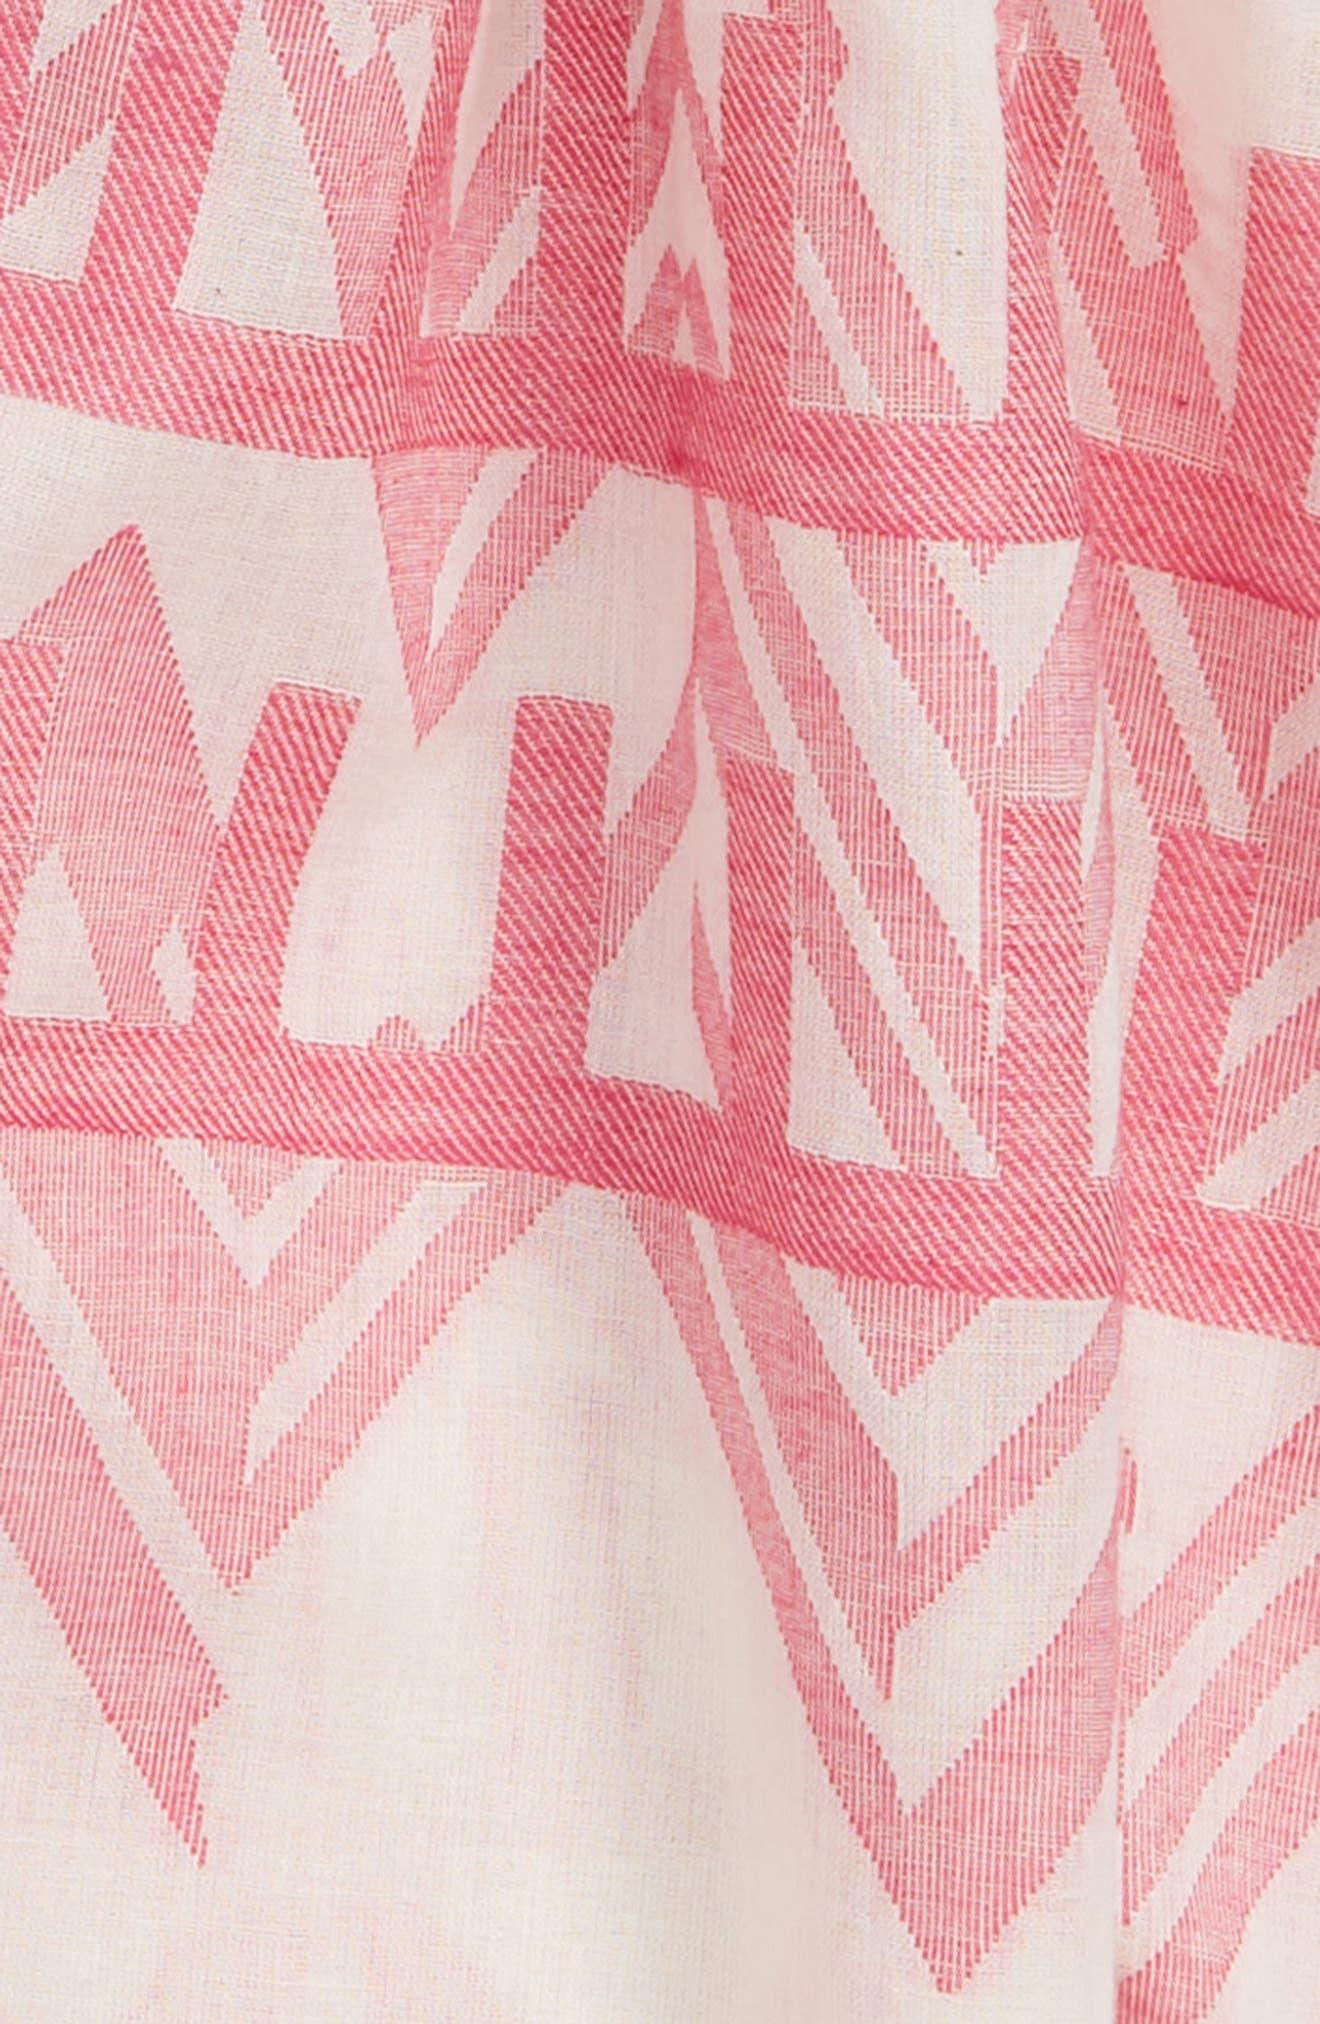 Jacquard Print Cotton Scarf,                             Alternate thumbnail 3, color,                             Cream Multi